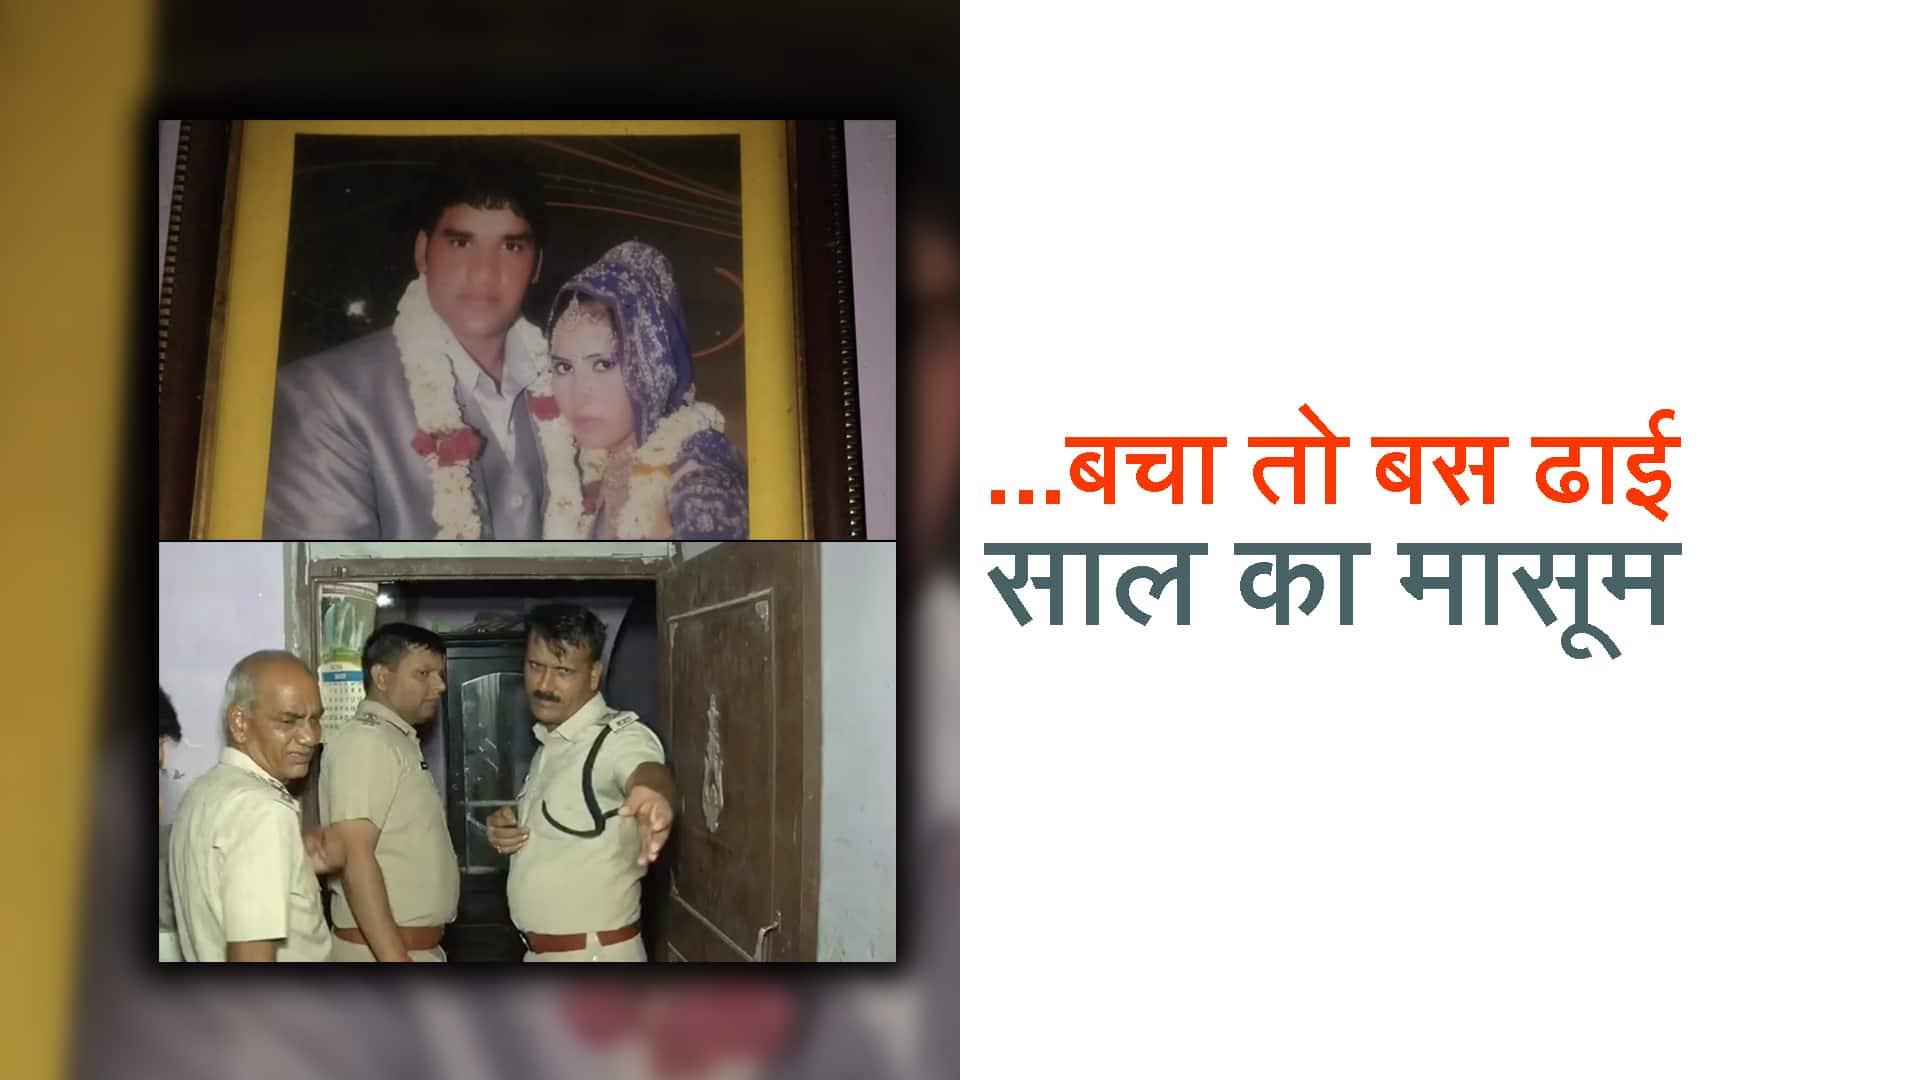 Murder family gurugram pataudi Haryana ncr